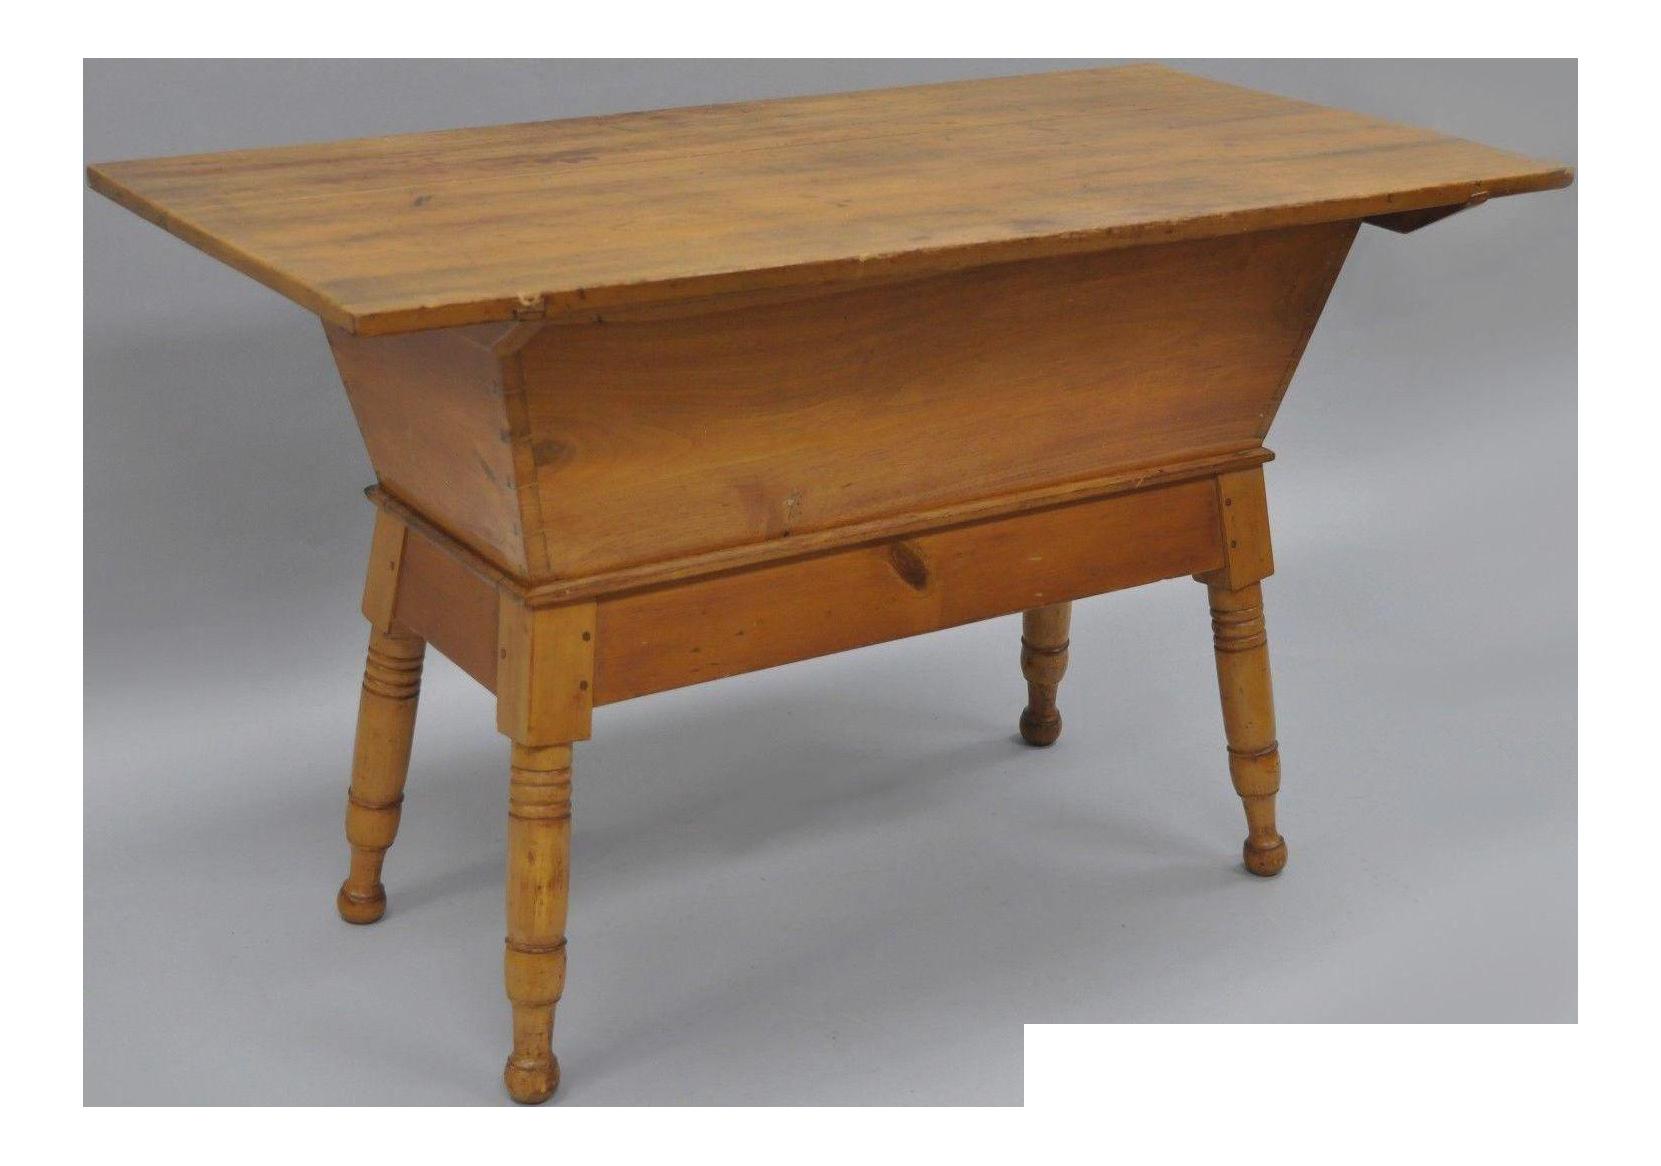 Antique Primitive Country Pine Wooden Dovetail Dough Box